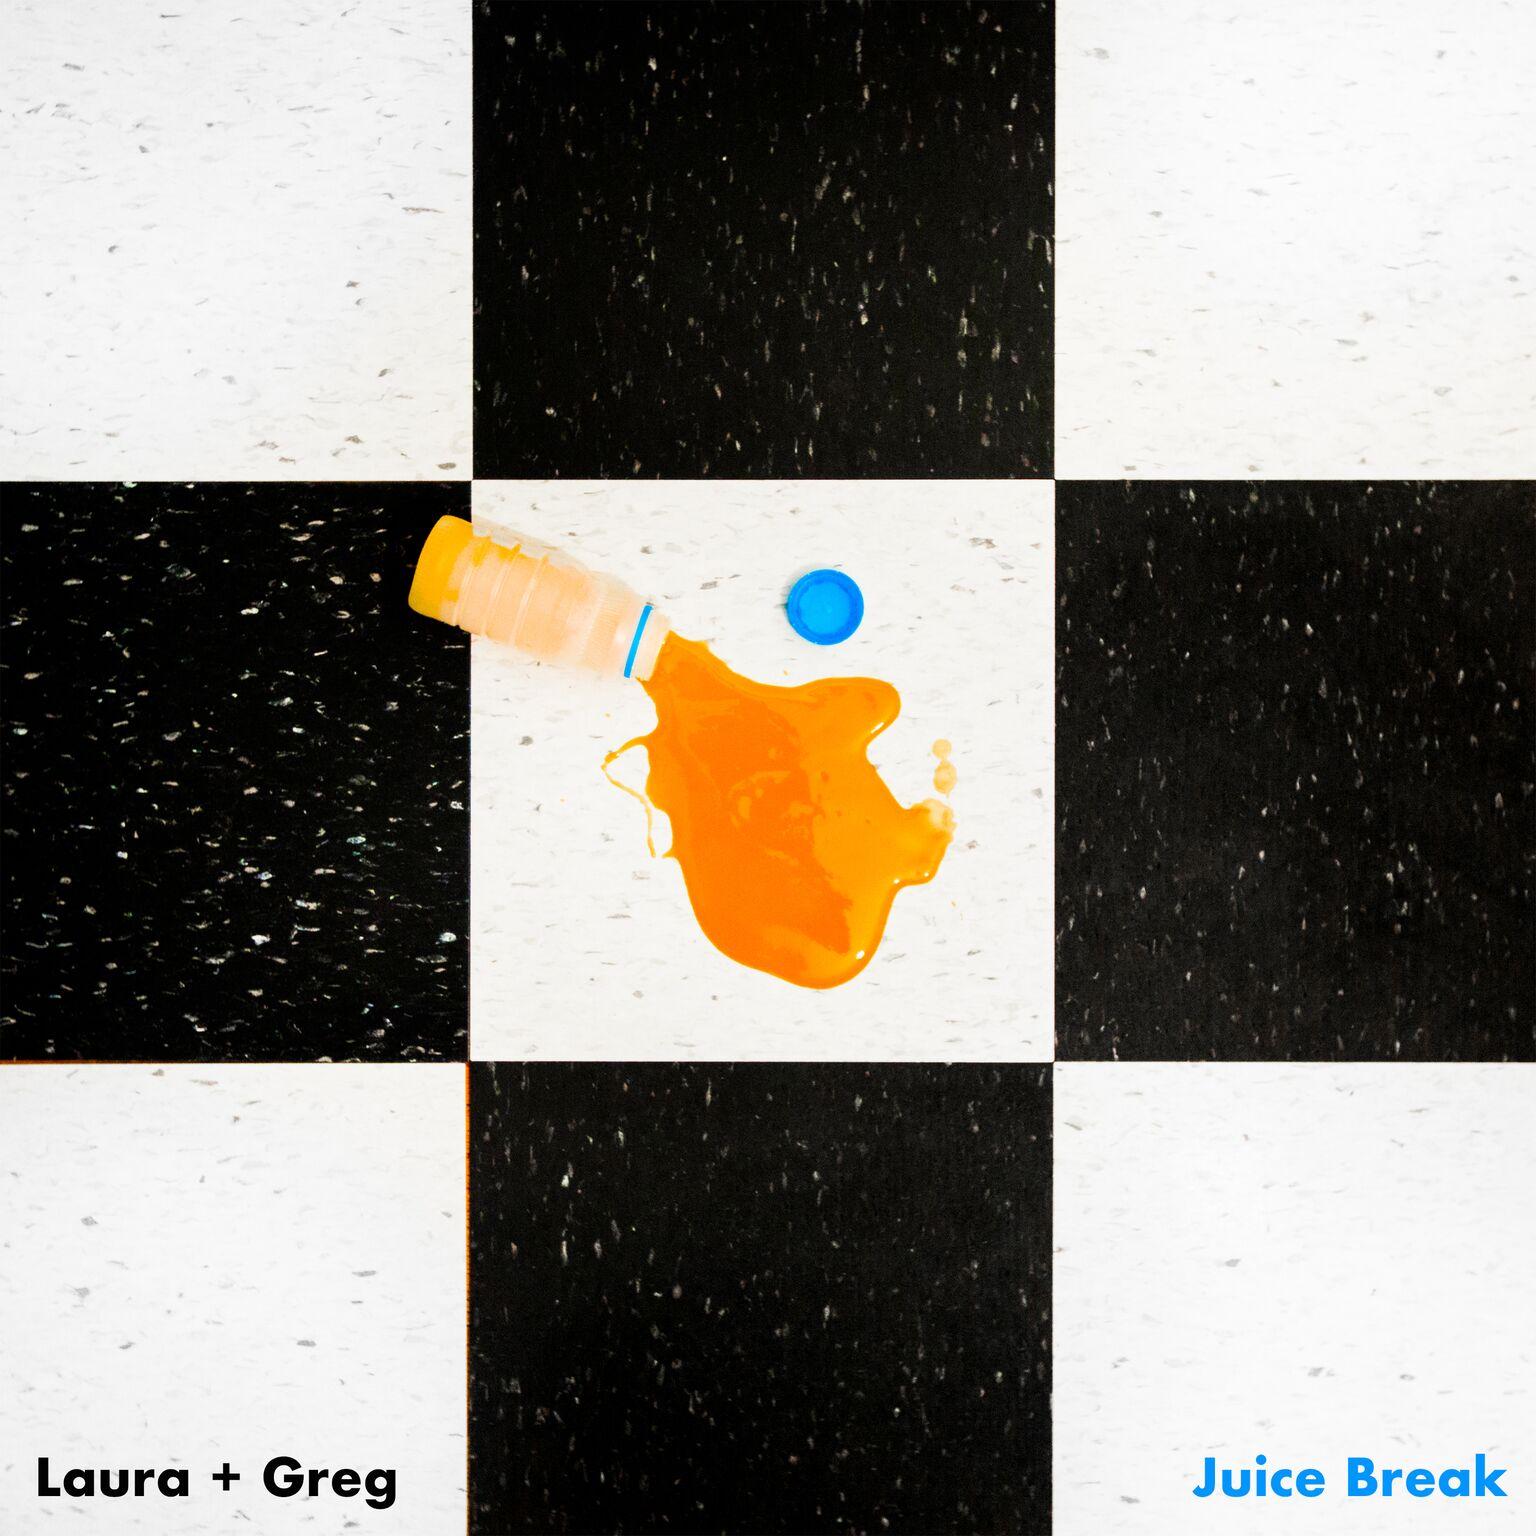 LAURA & GREG - JUICE BREAK